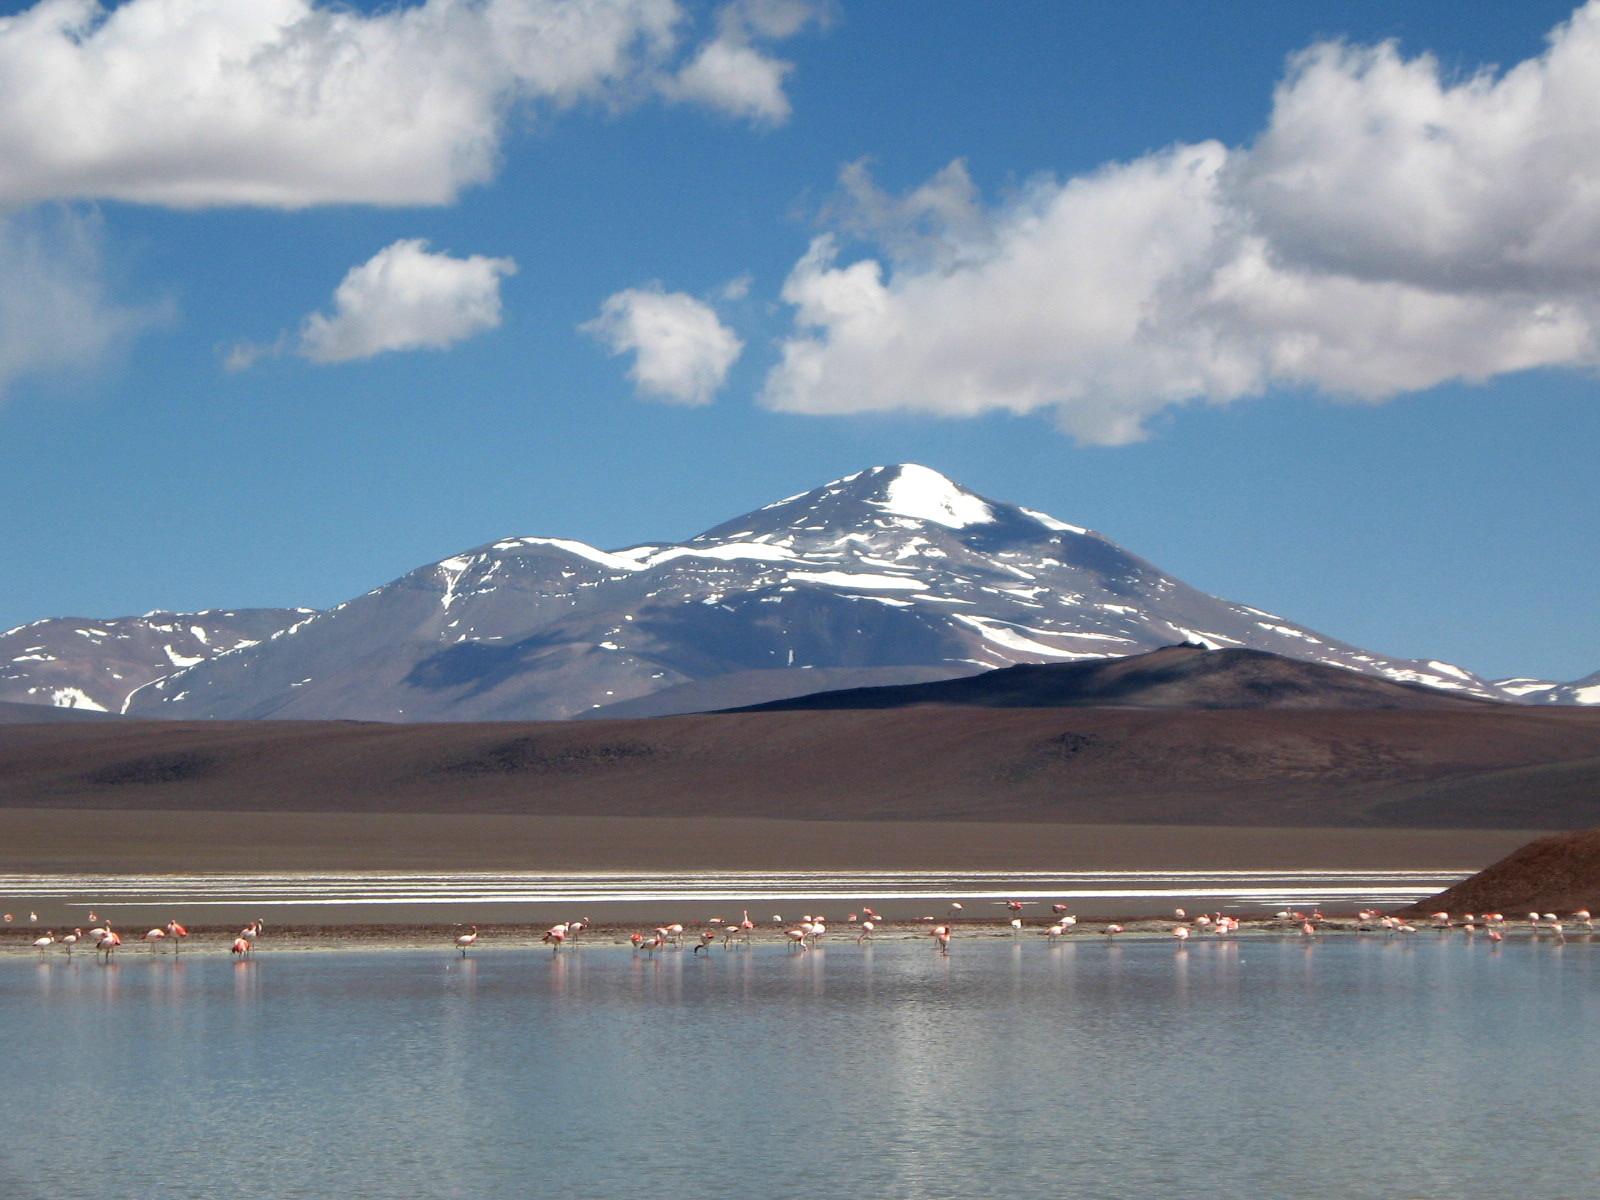 Laguna Brava - Ruta de Los Volcanes